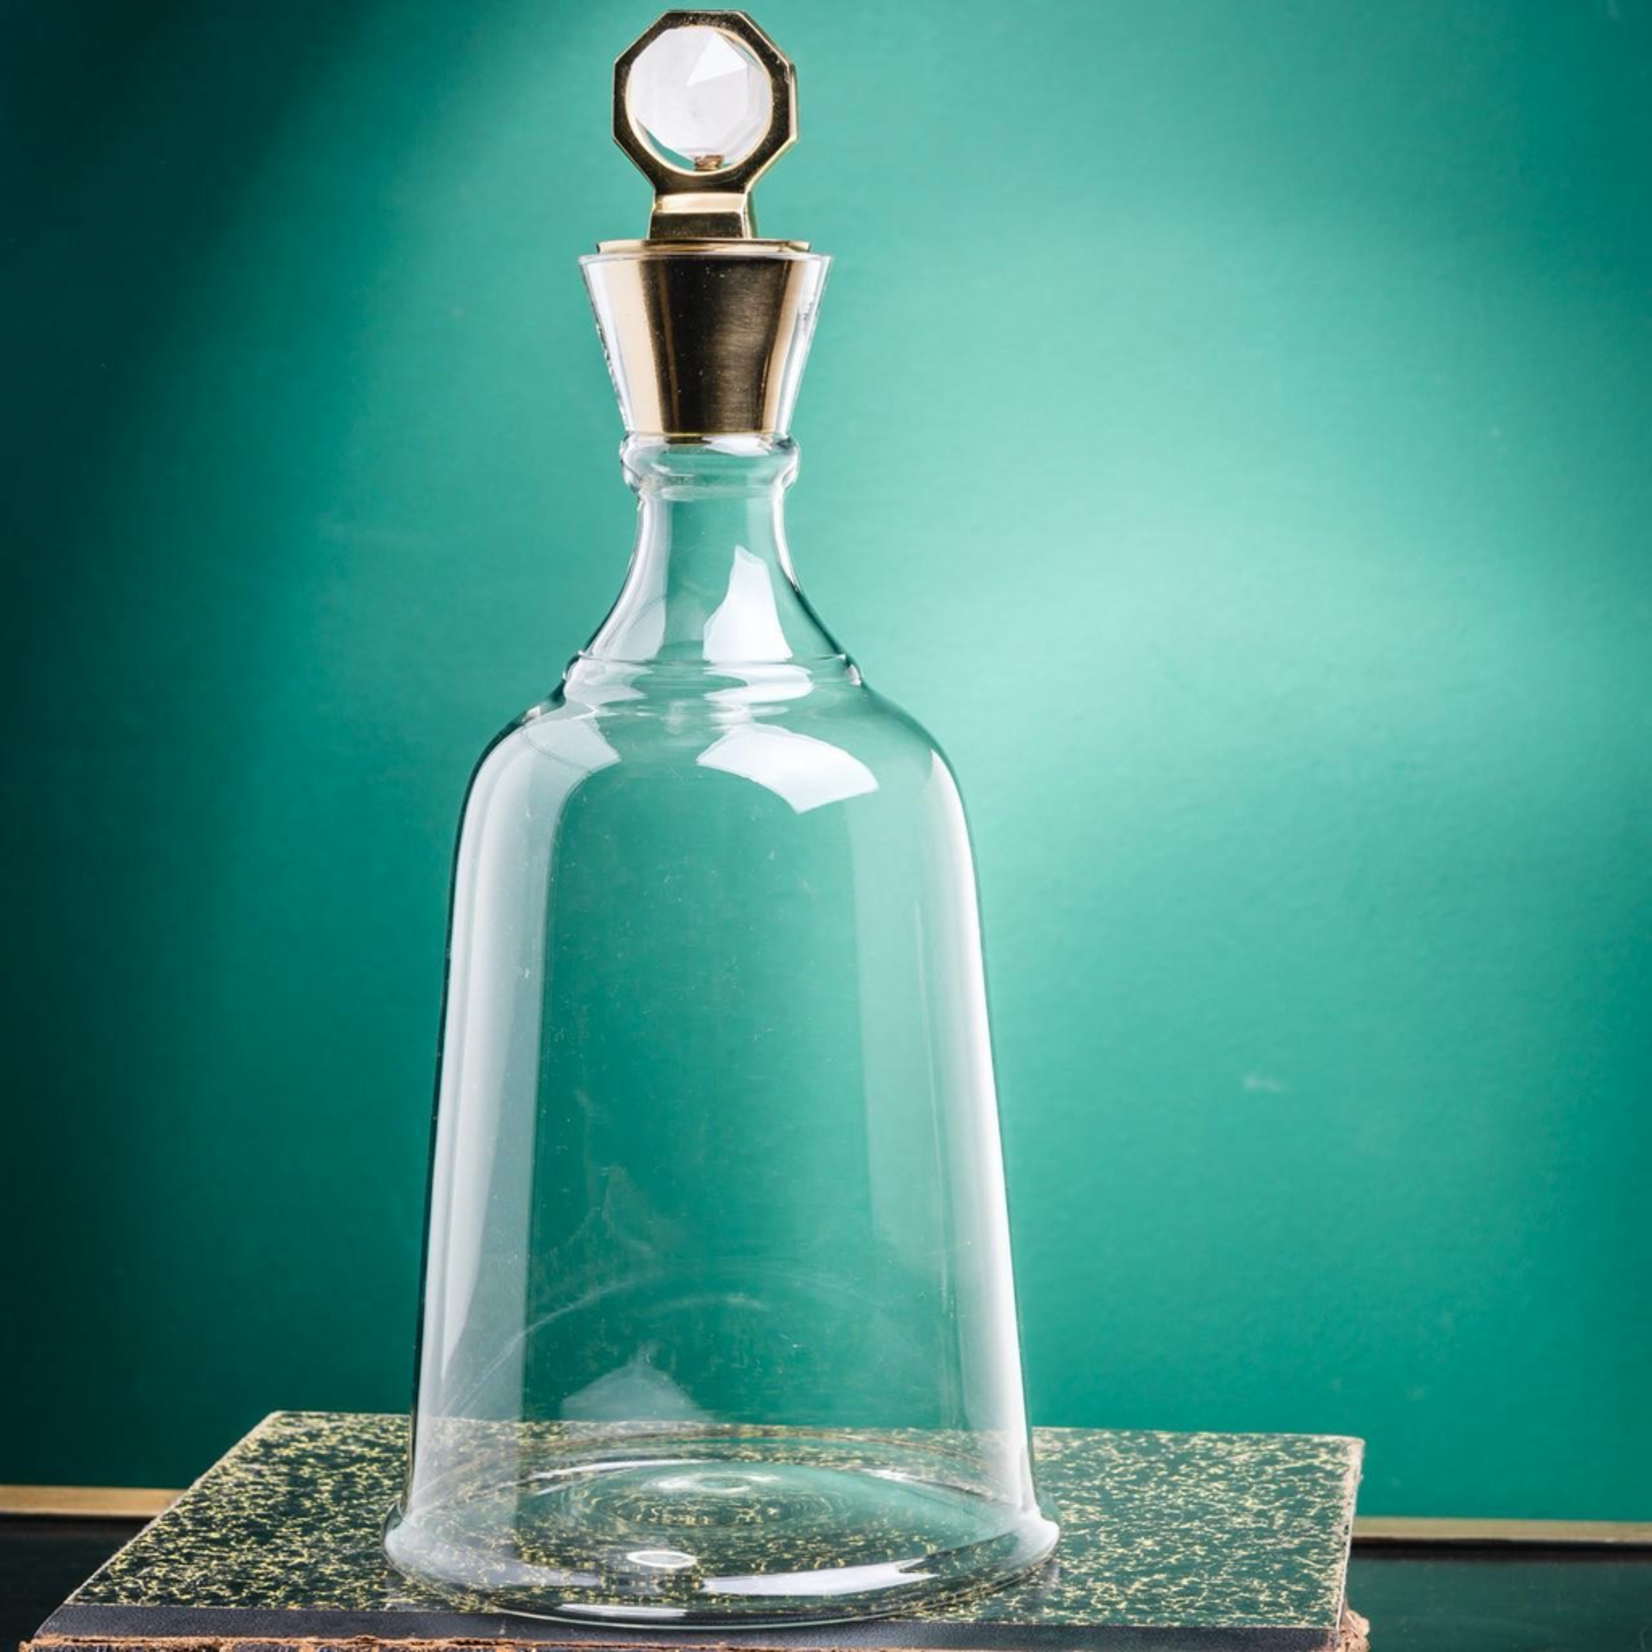 OBJET DE CURIOSITE HIGH GLASS DECANTER, BI-TERMINATED CRYSTAL LID